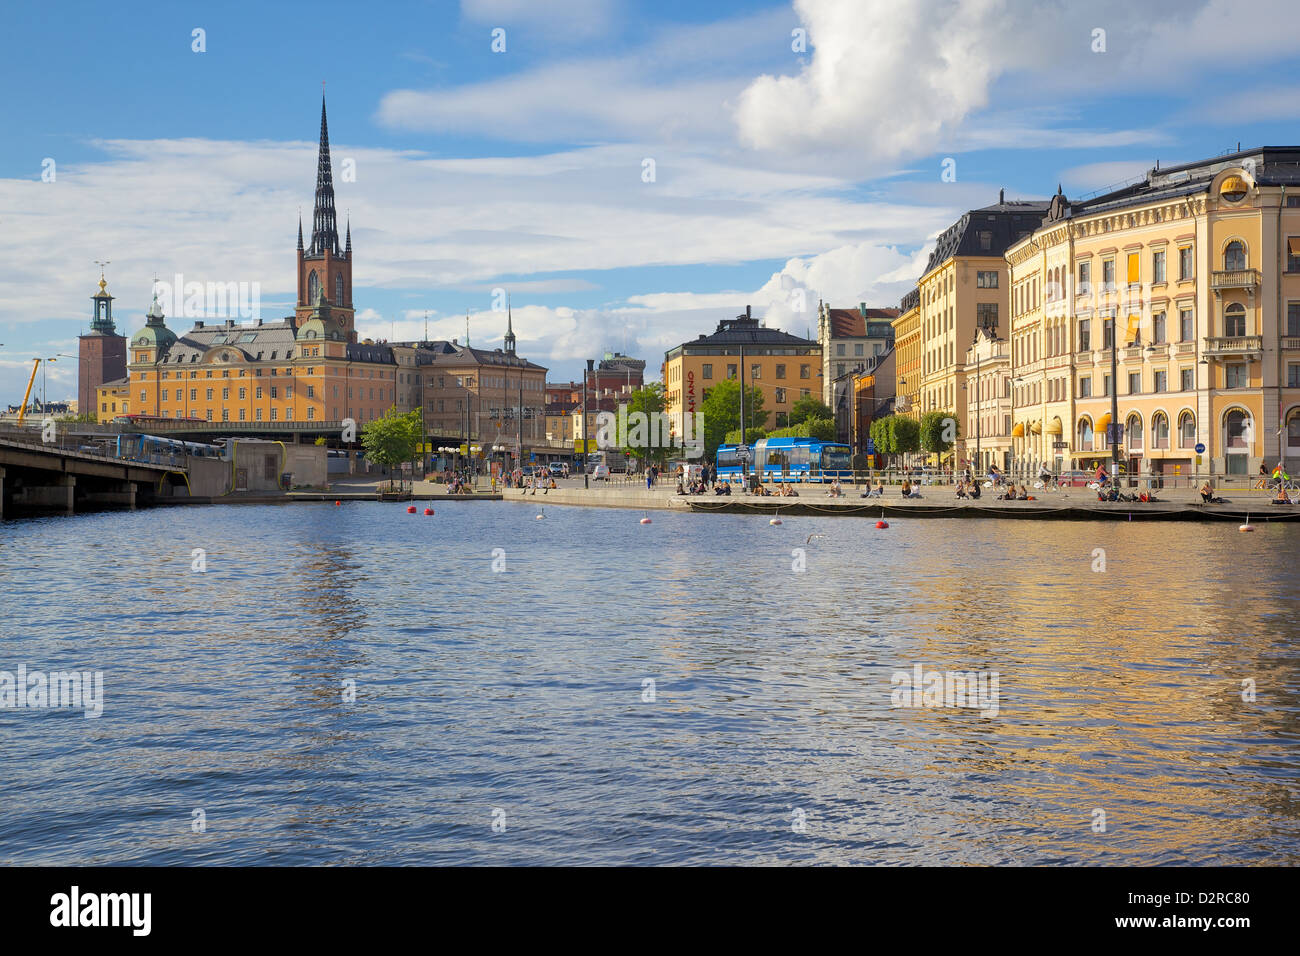 Riddarholmen with spire of Riddarholmskyrkan (Riddarholmen Church) on the skyline, Stockholm, Sweden, Europe - Stock Image